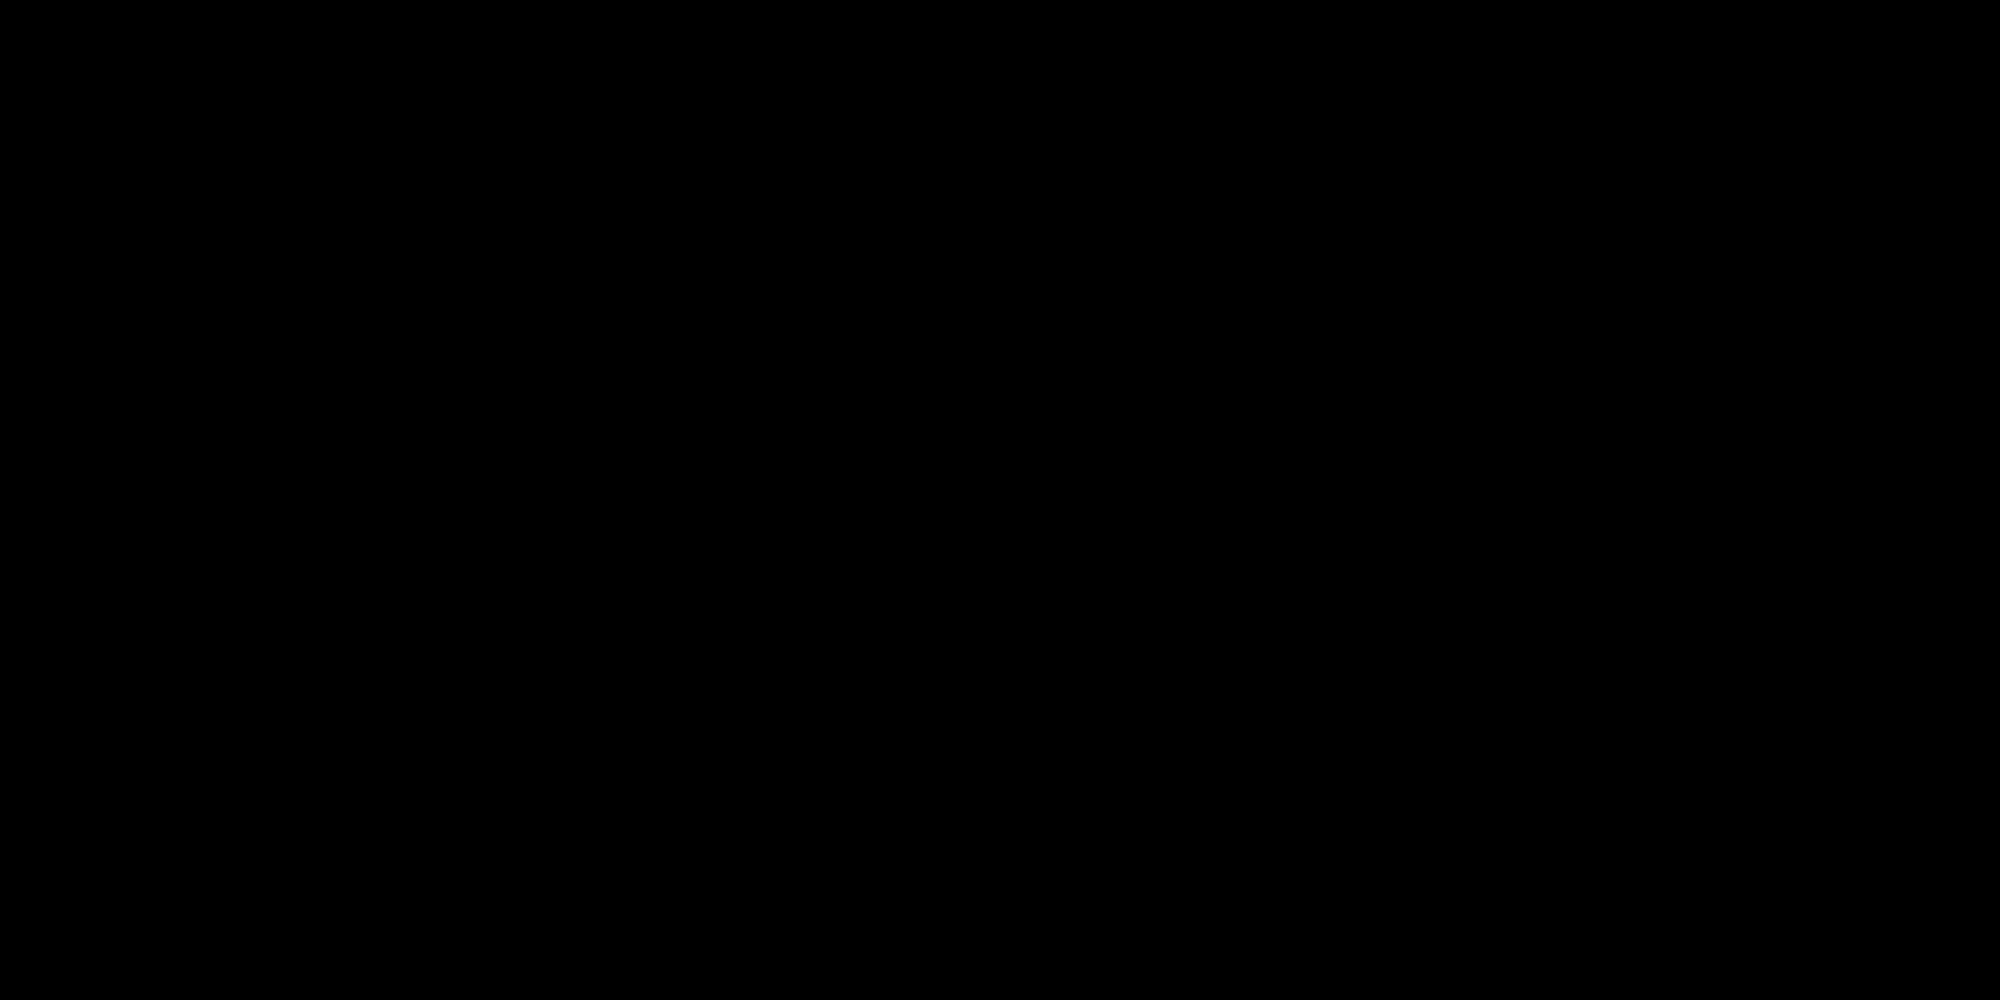 Panel Bottom 06